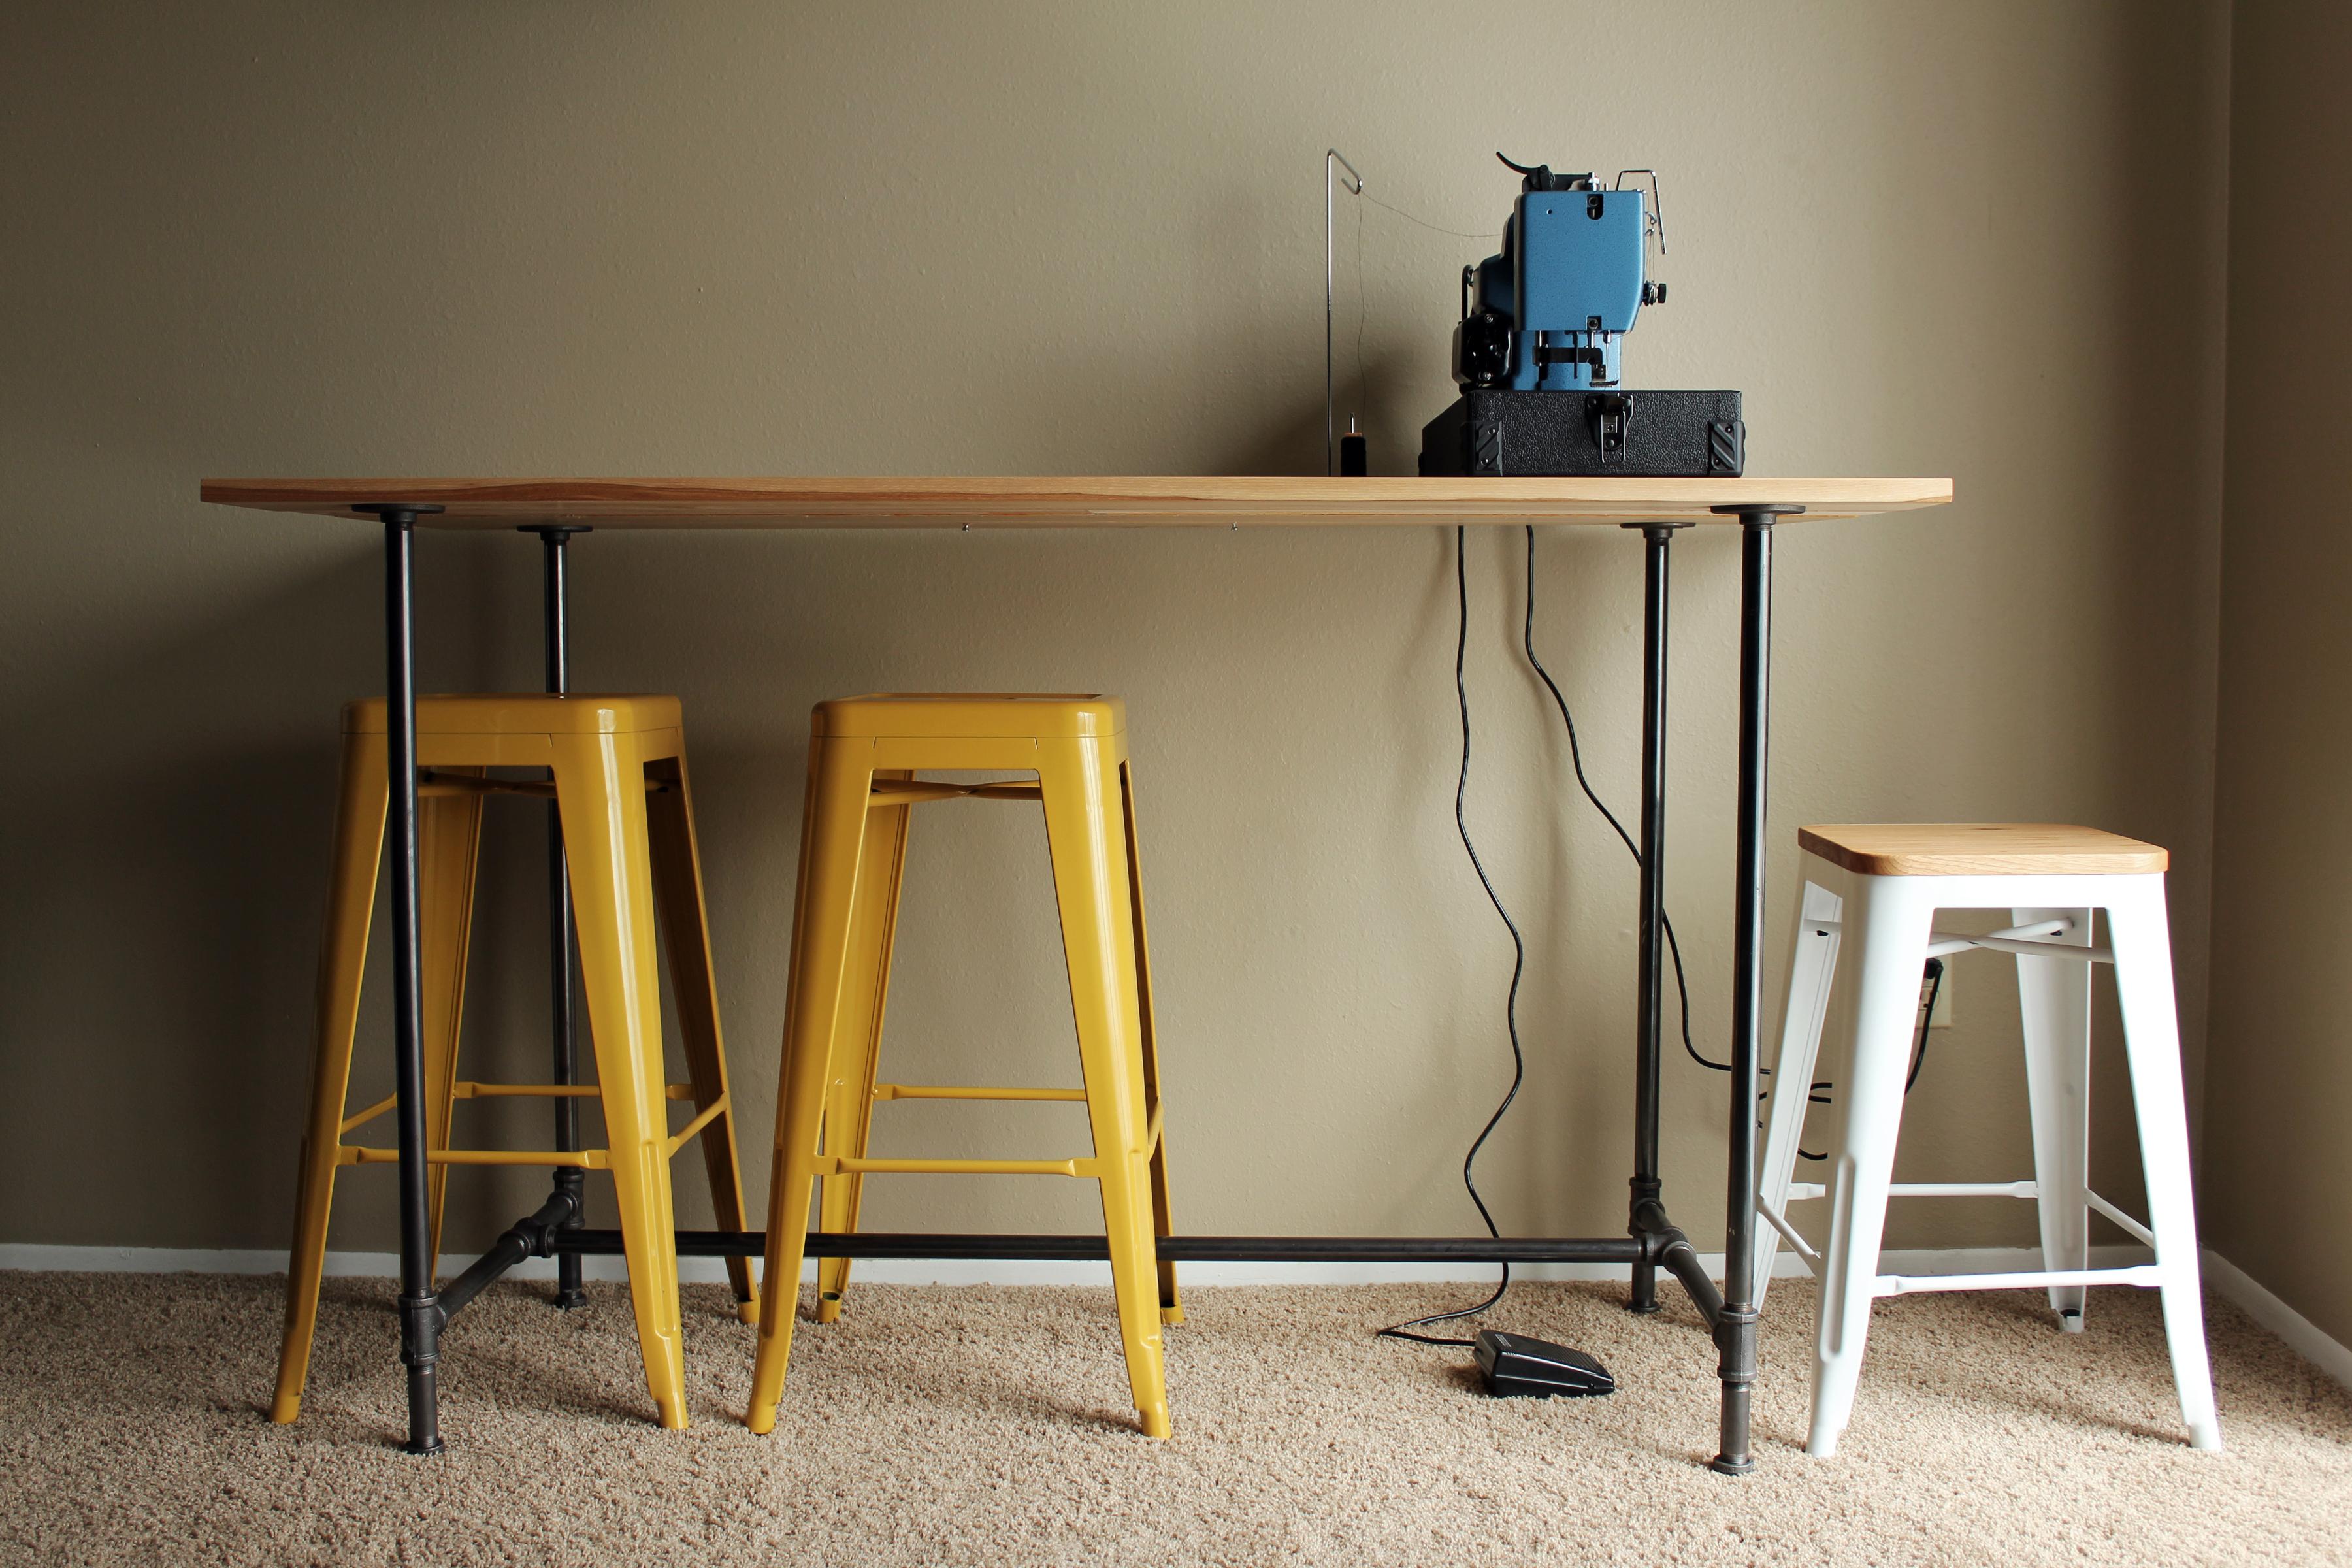 furniture work moller adam table